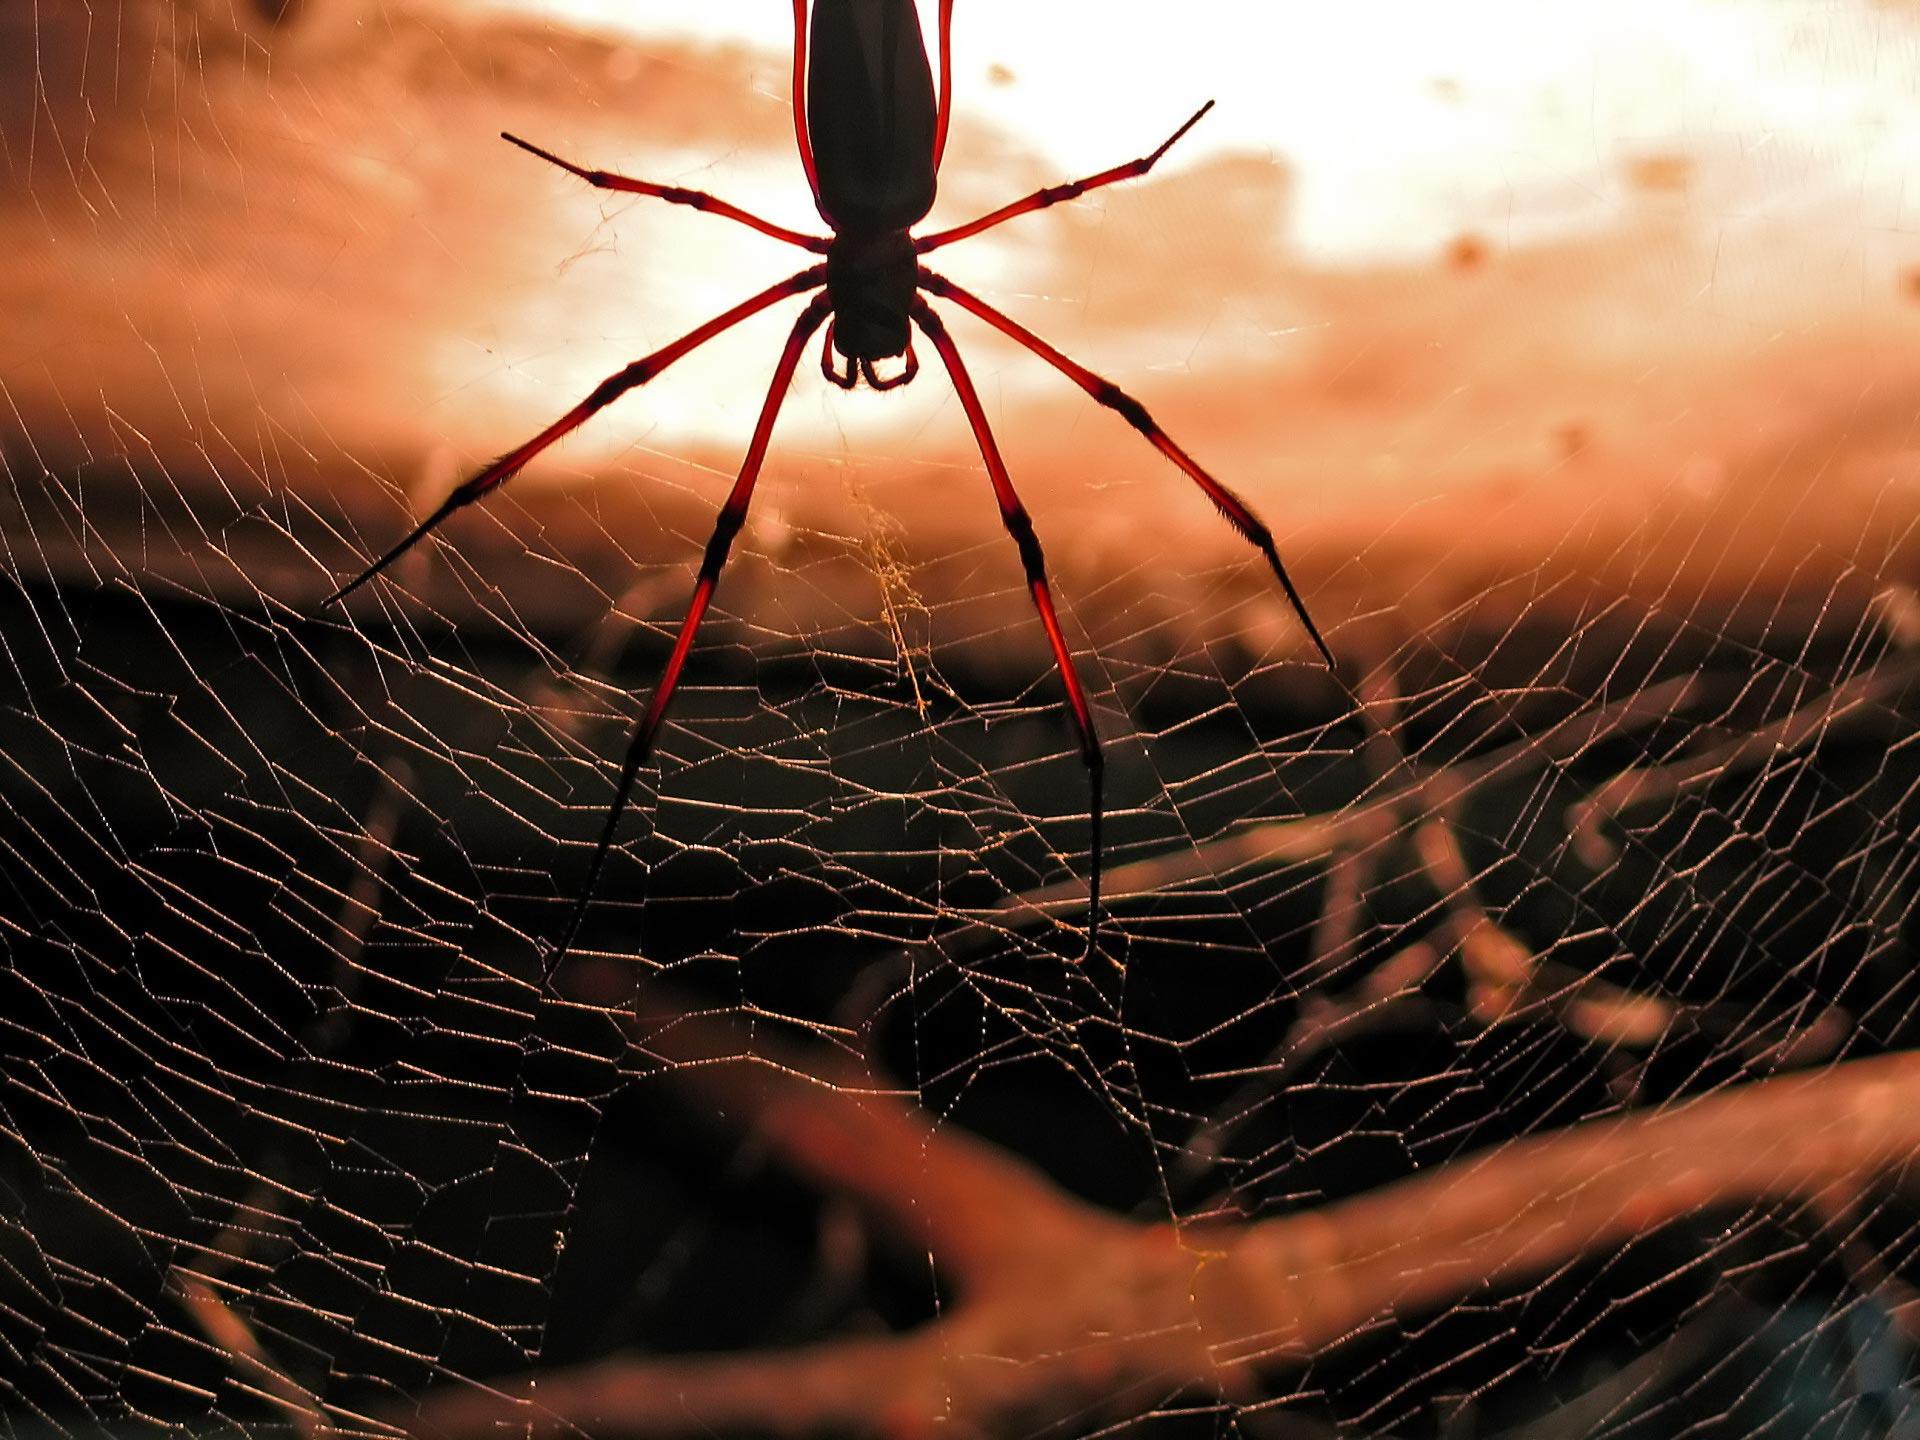 spider picture 1080p - HD Desktop Wallpapers   4k HD